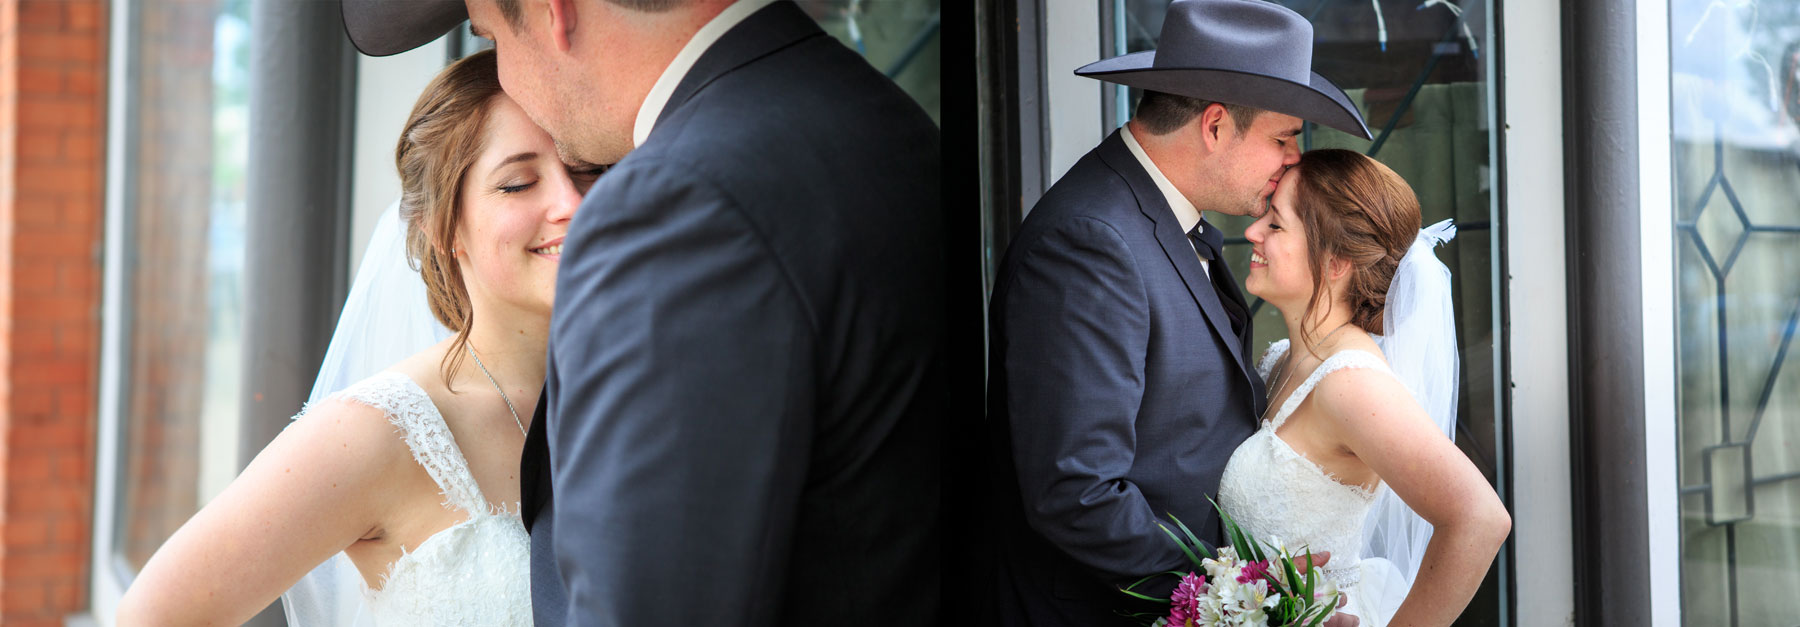 Angela & Patrick - Lacombe, Alberta Wedding Photography - Olson Studios (18)